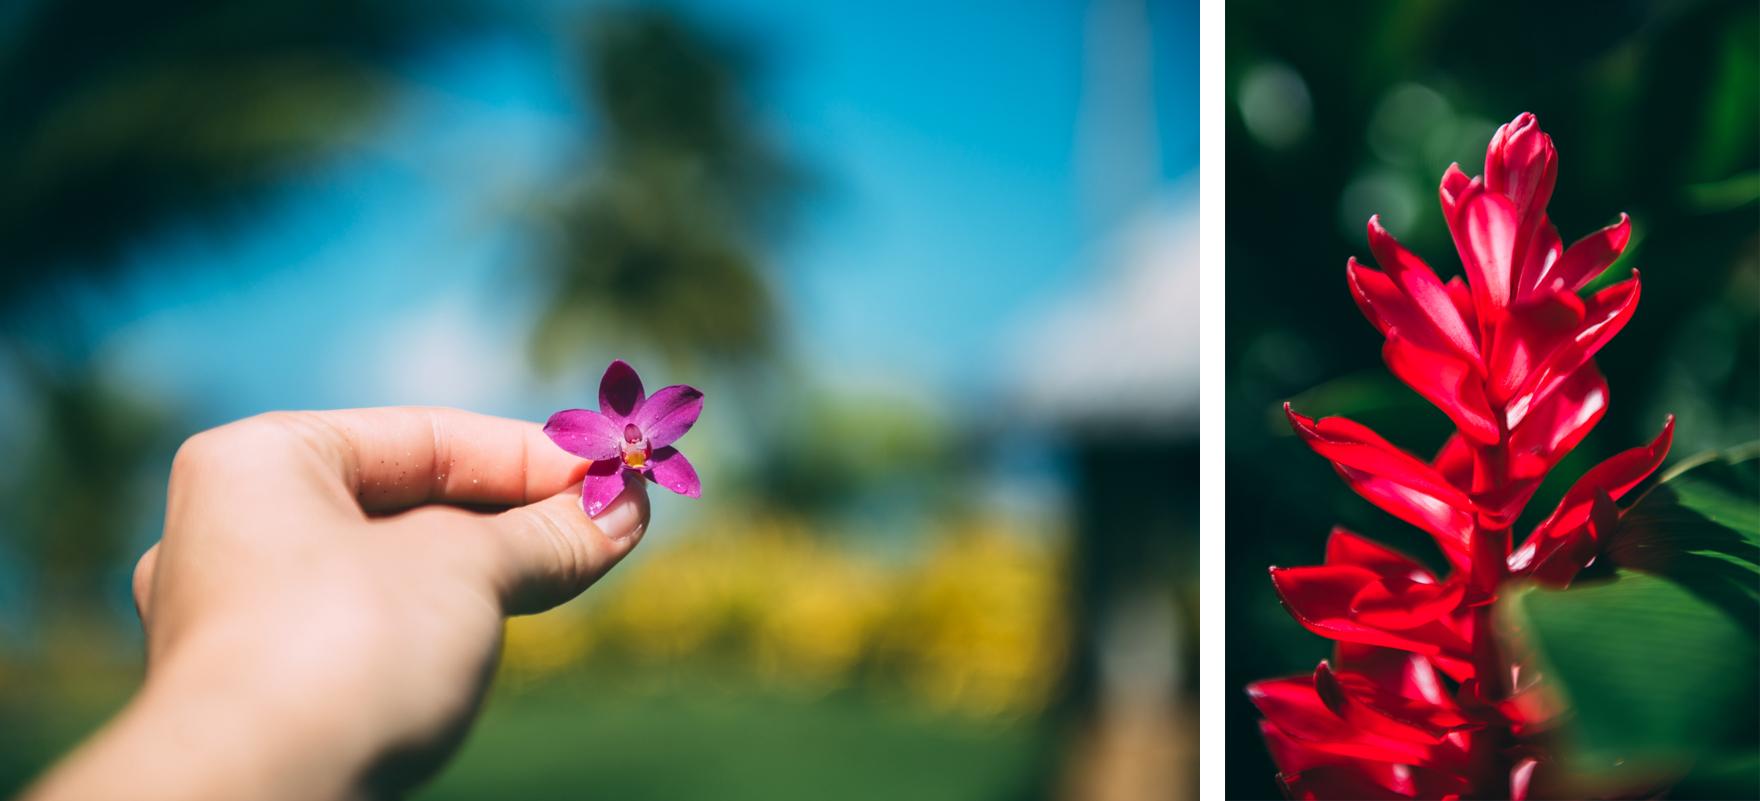 Samoa-Lola-Photography-3.jpg